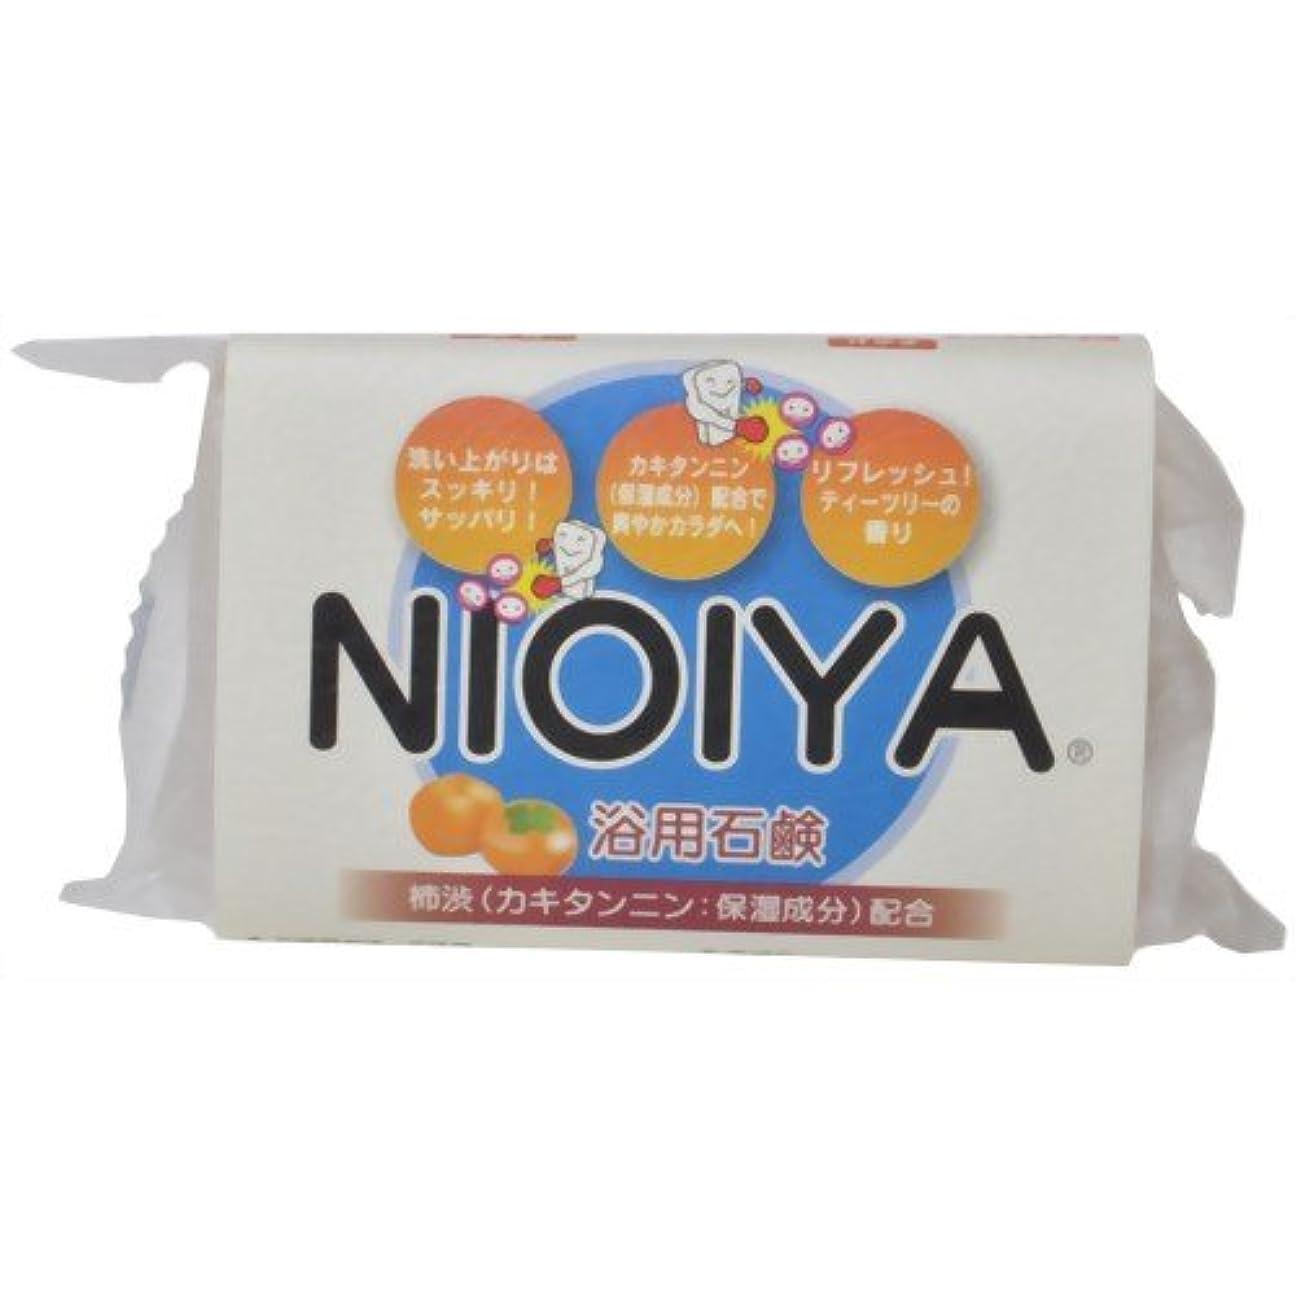 NIOIYA 浴用石鹸 120g